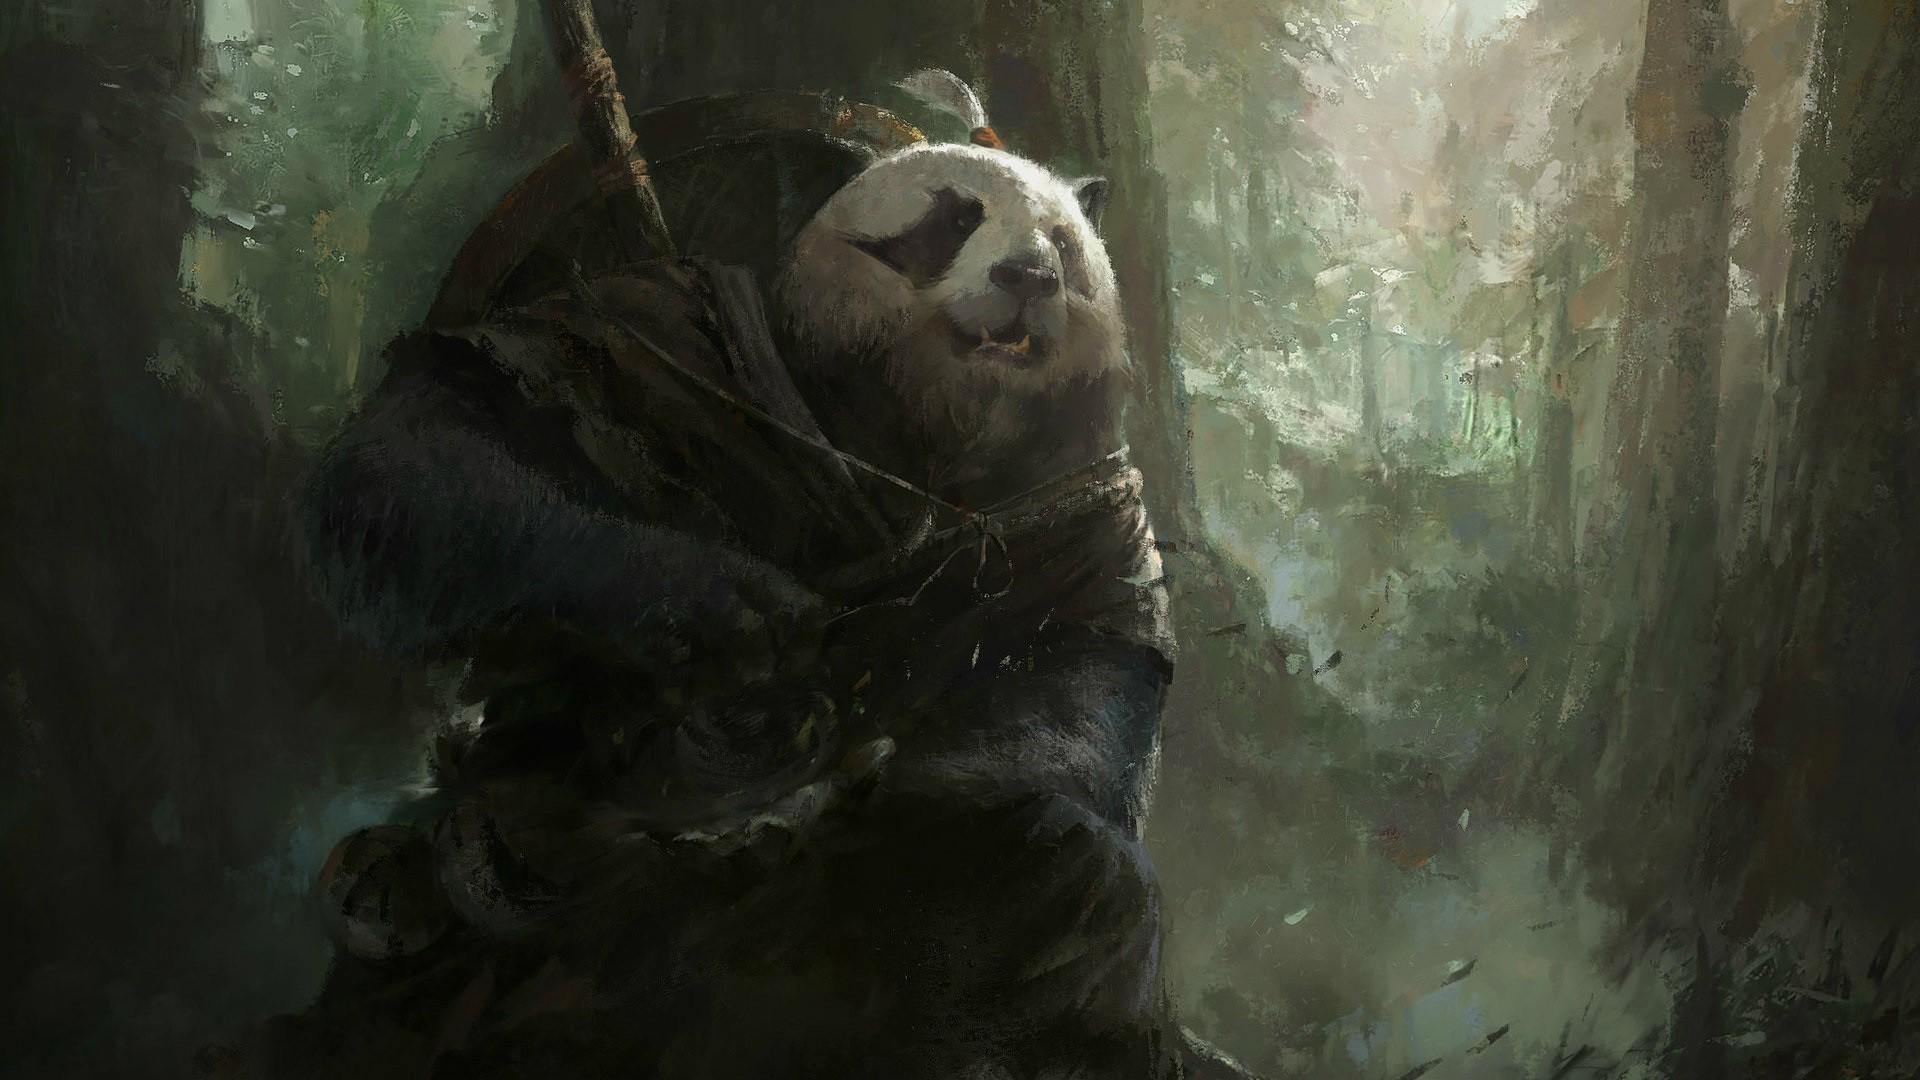 Jungle Wallpaper World Of Warcraft: Wallpaper : Fantasy Art, World Of Warcraft, Magic, Panda